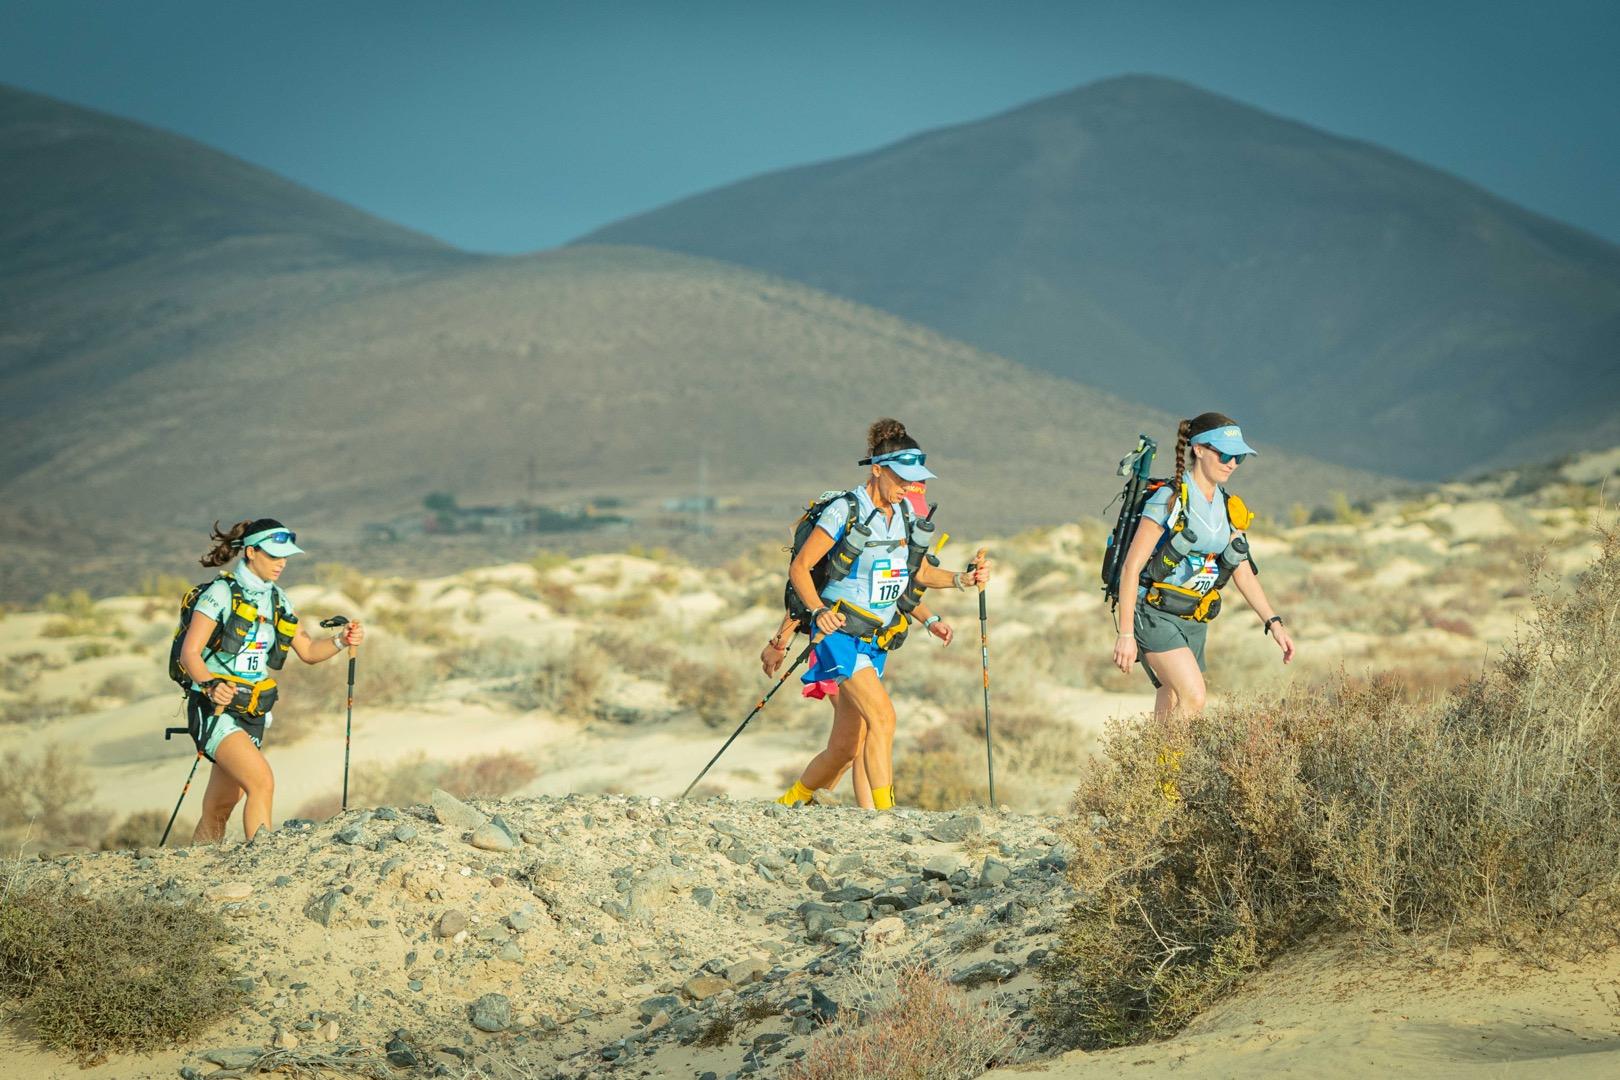 Crónica Etapa 2 Half Marathon des Sables Fuerteventura 2019